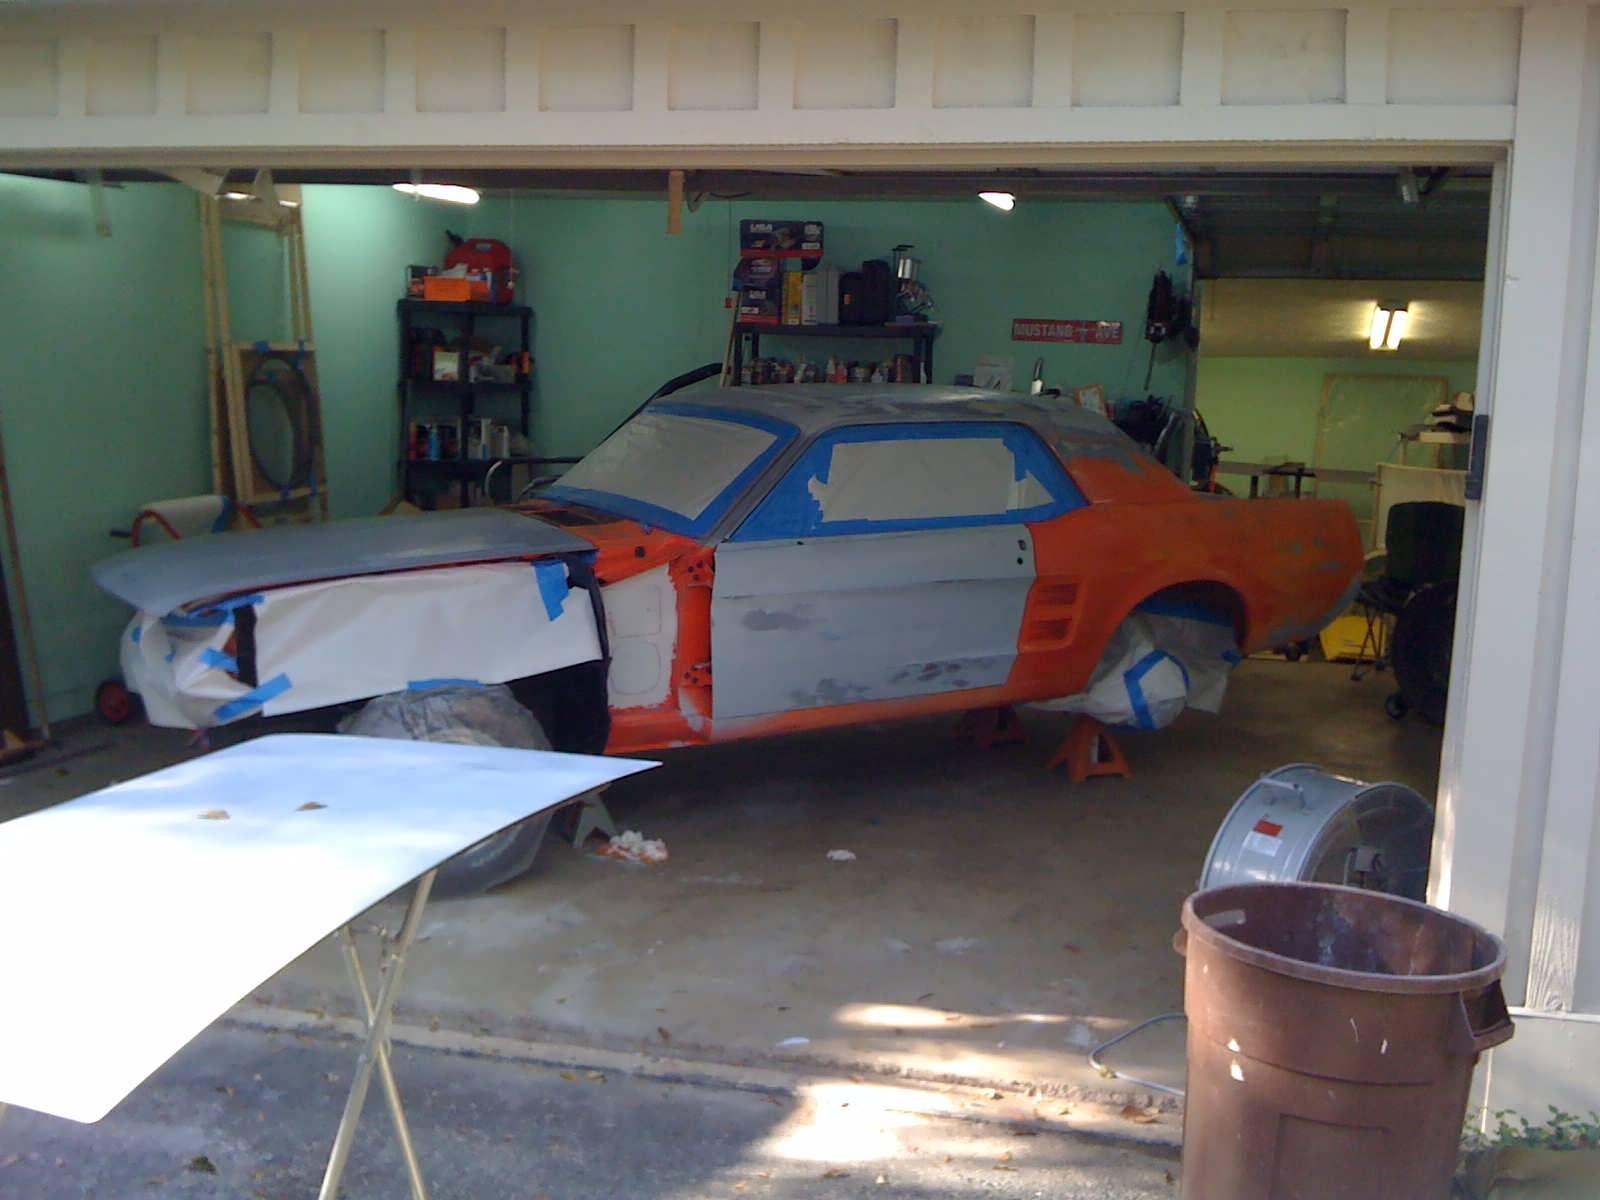 Garage Ventilation Hose : Garage ventilation classic cars and tools